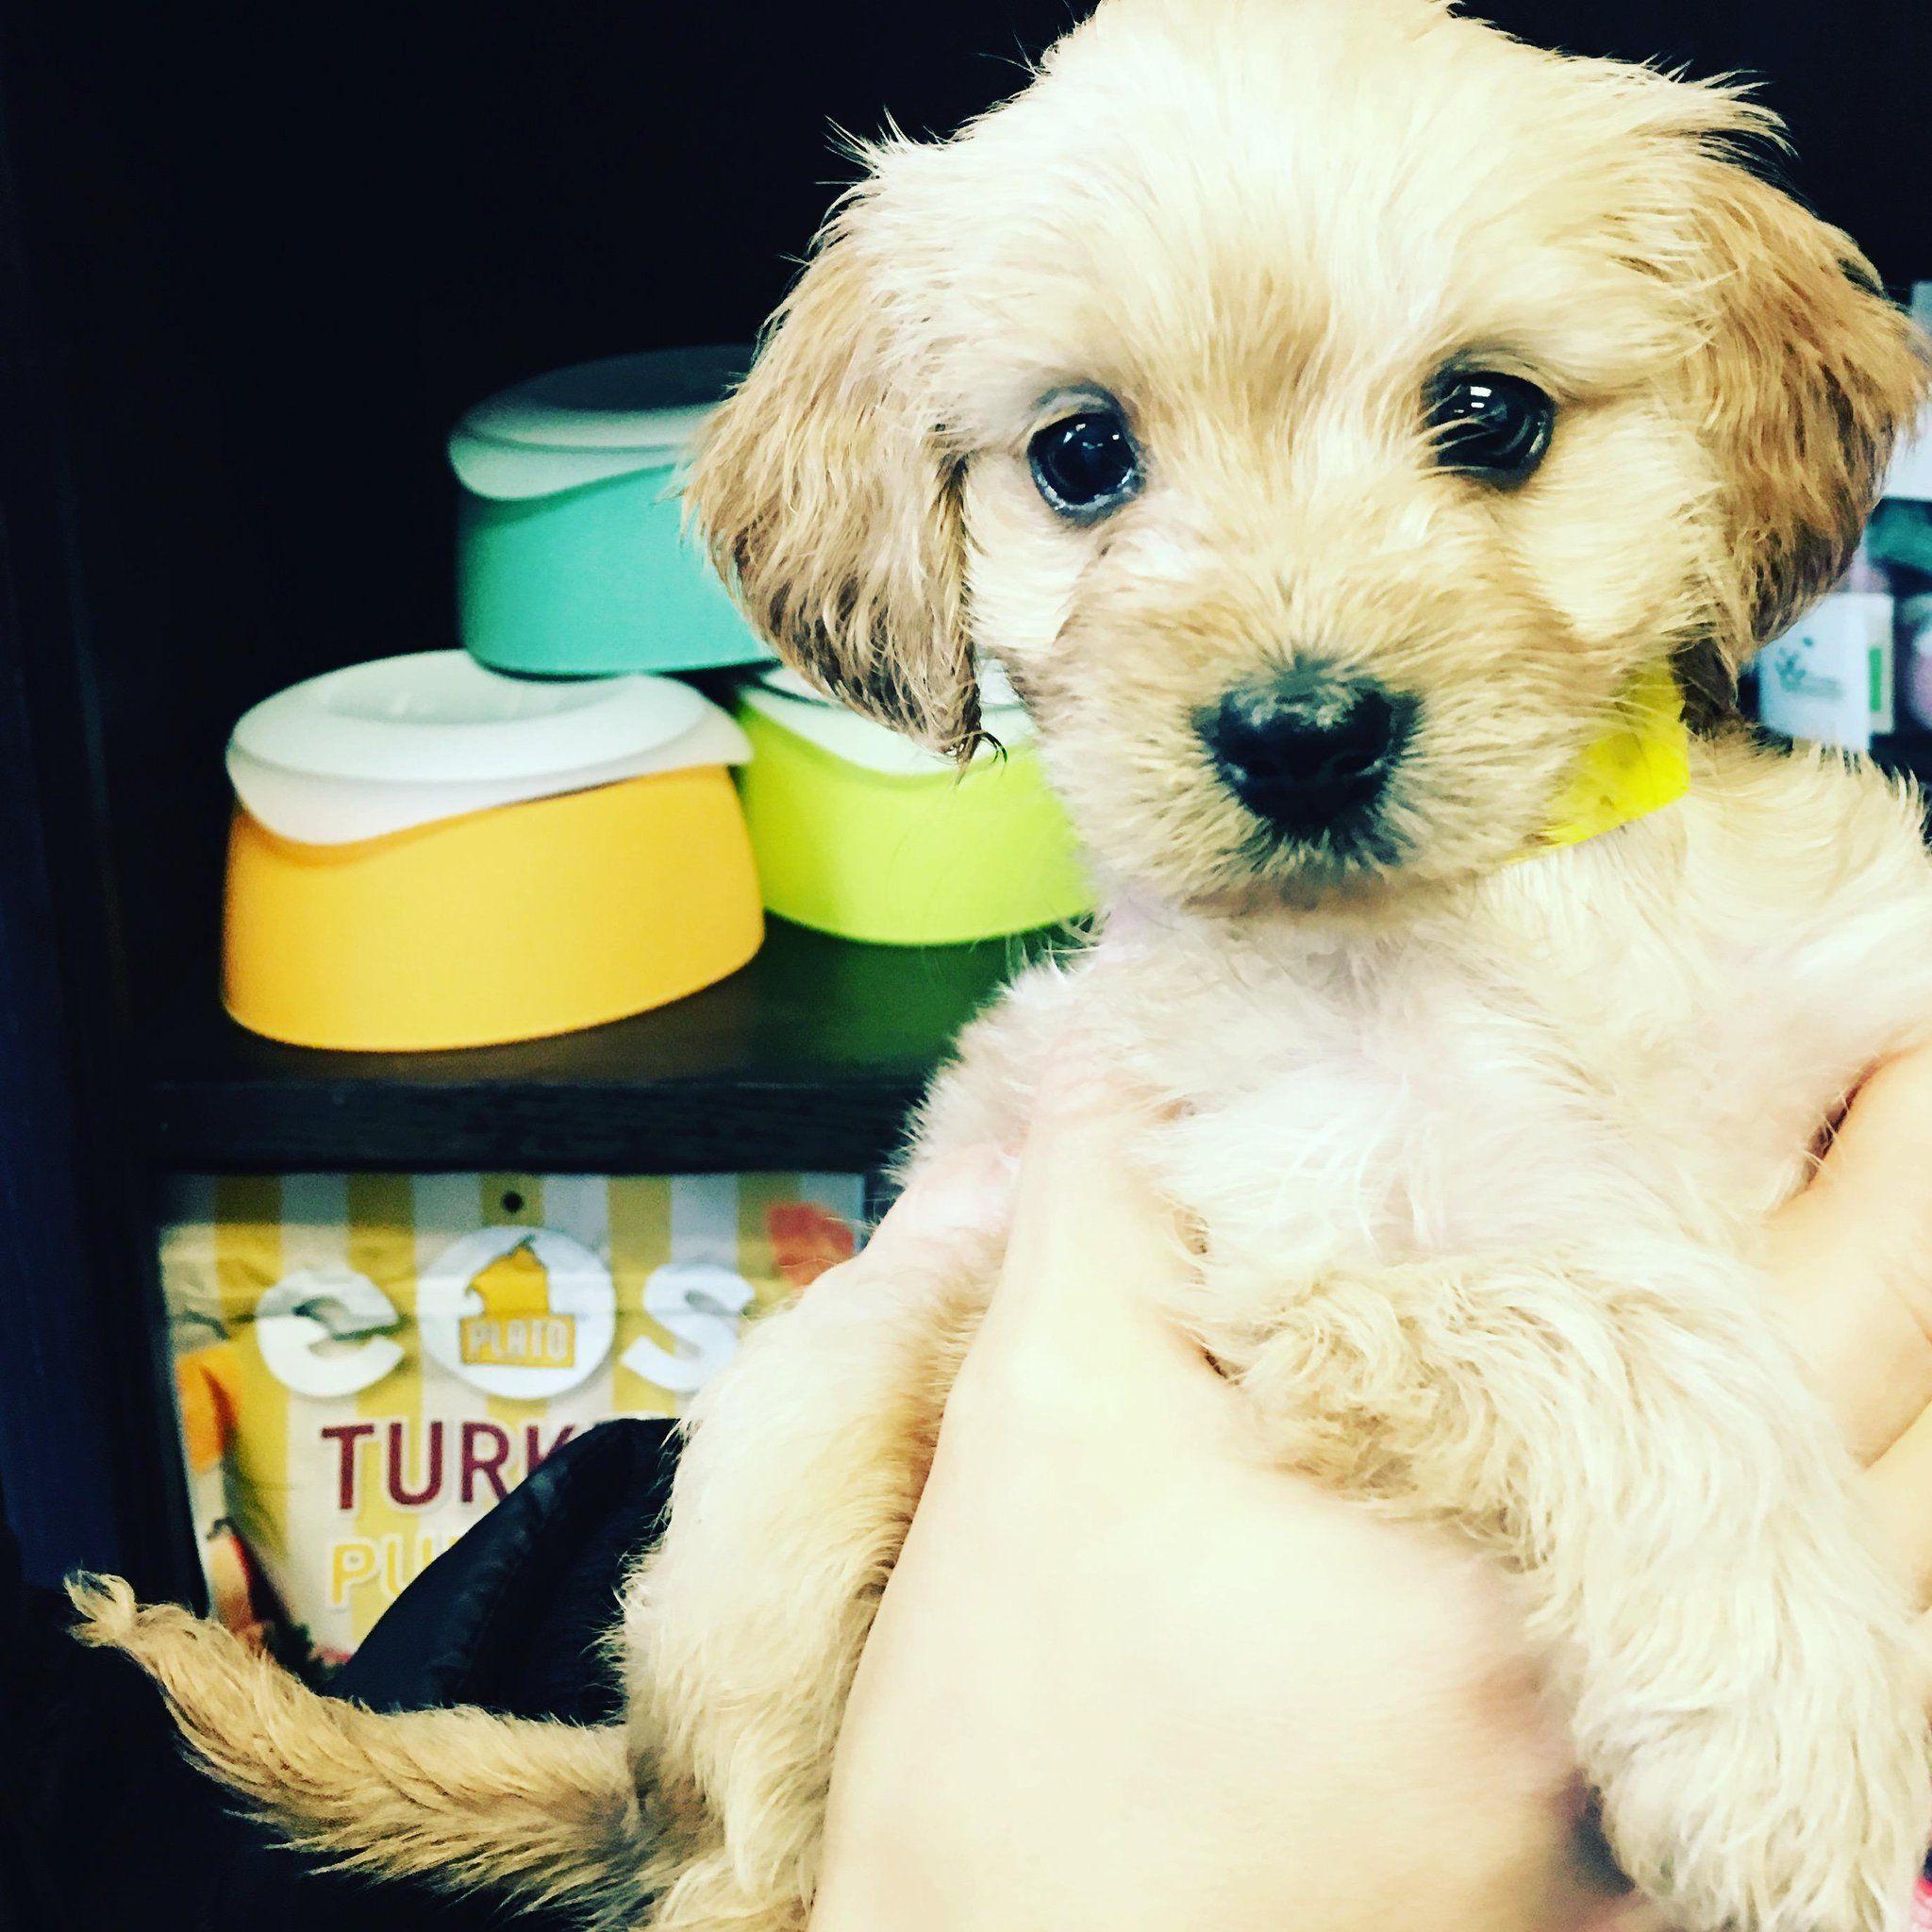 Gayweho Dogs 4 U On Twitter Dogs Cocker Spaniel Small Dogs